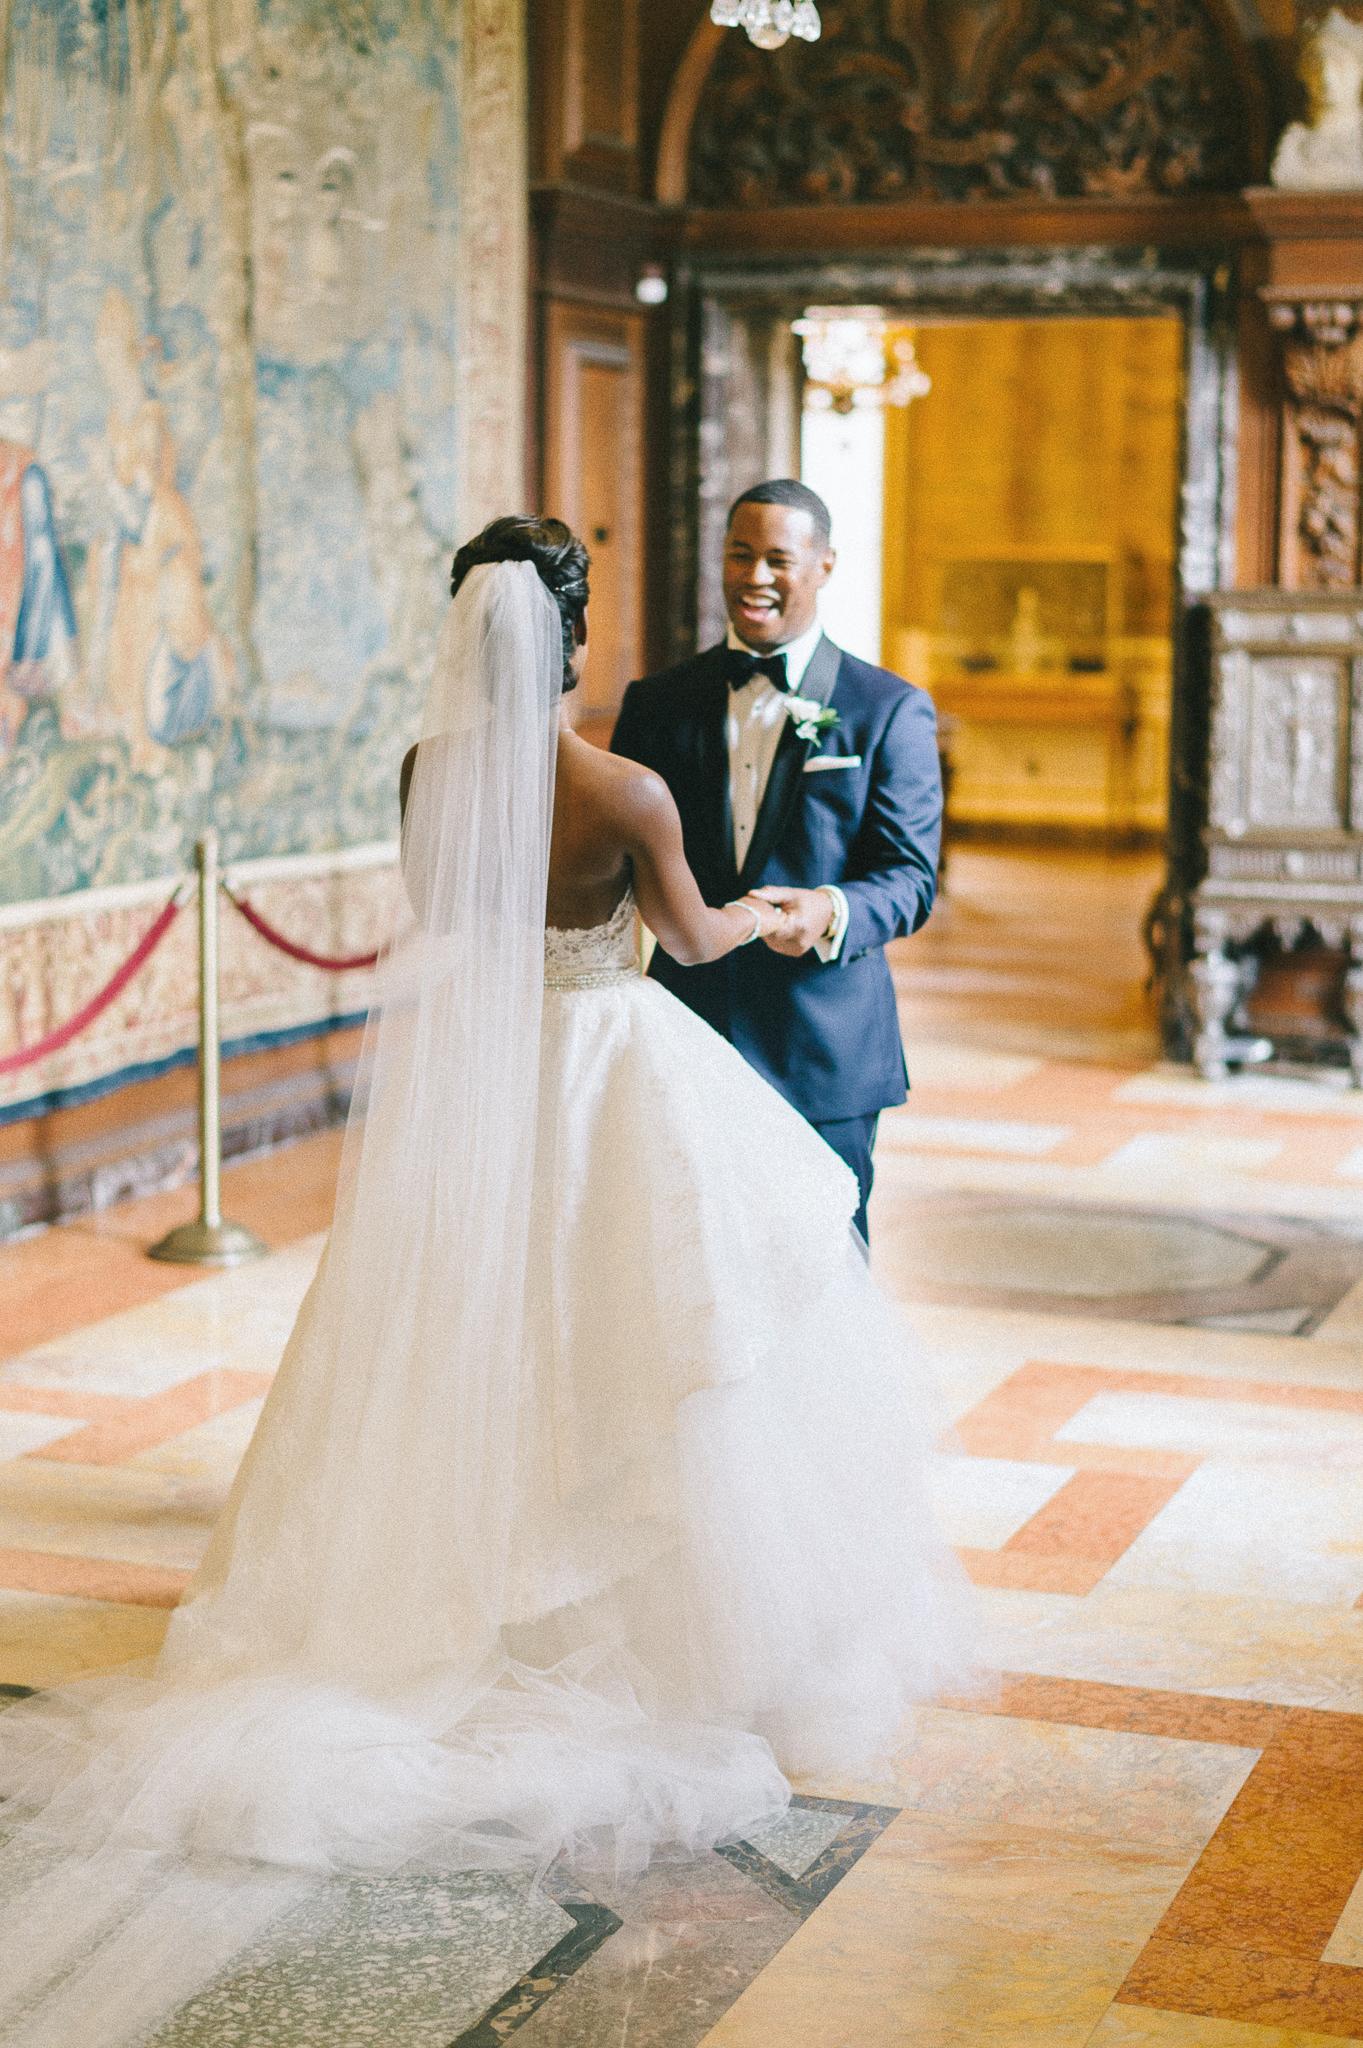 abby marcus wedding firstlook 85